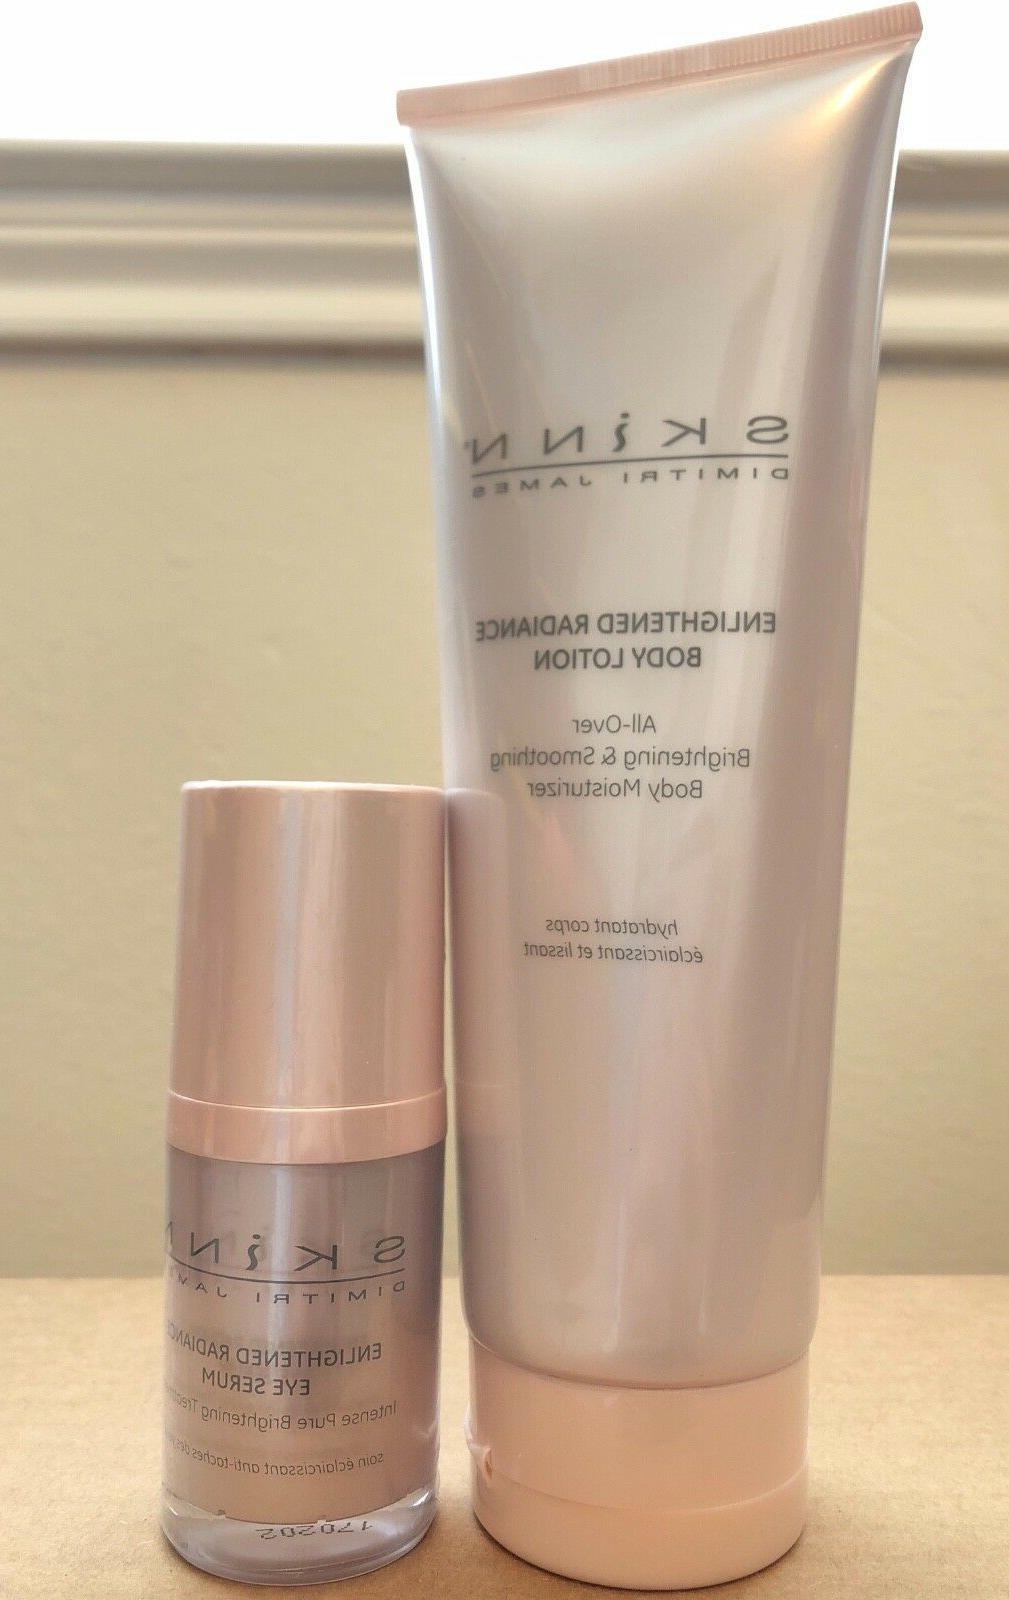 Skinn Enlightened Radiance Eye Serum & Body Lotion Duo - New